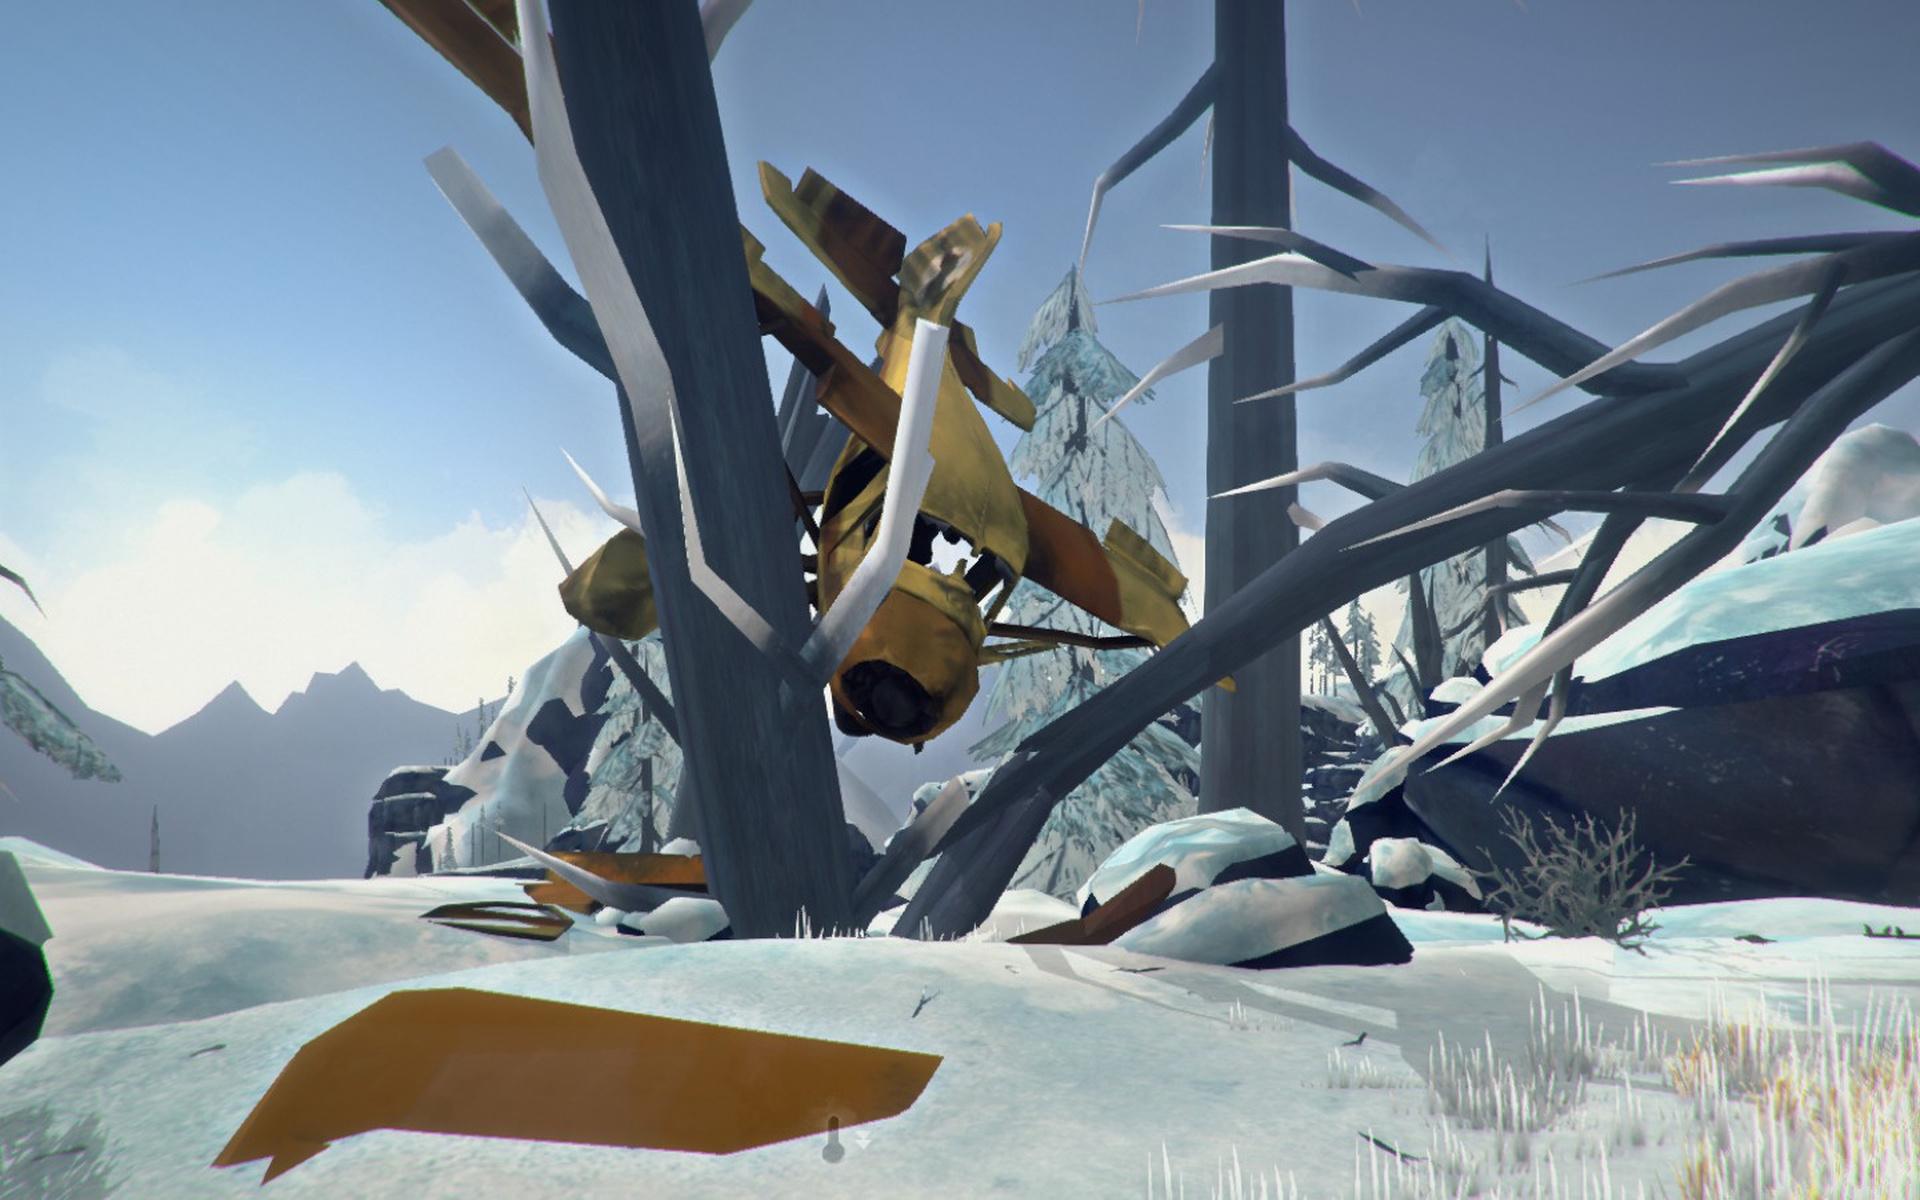 Mackenzie's Crashed Plane